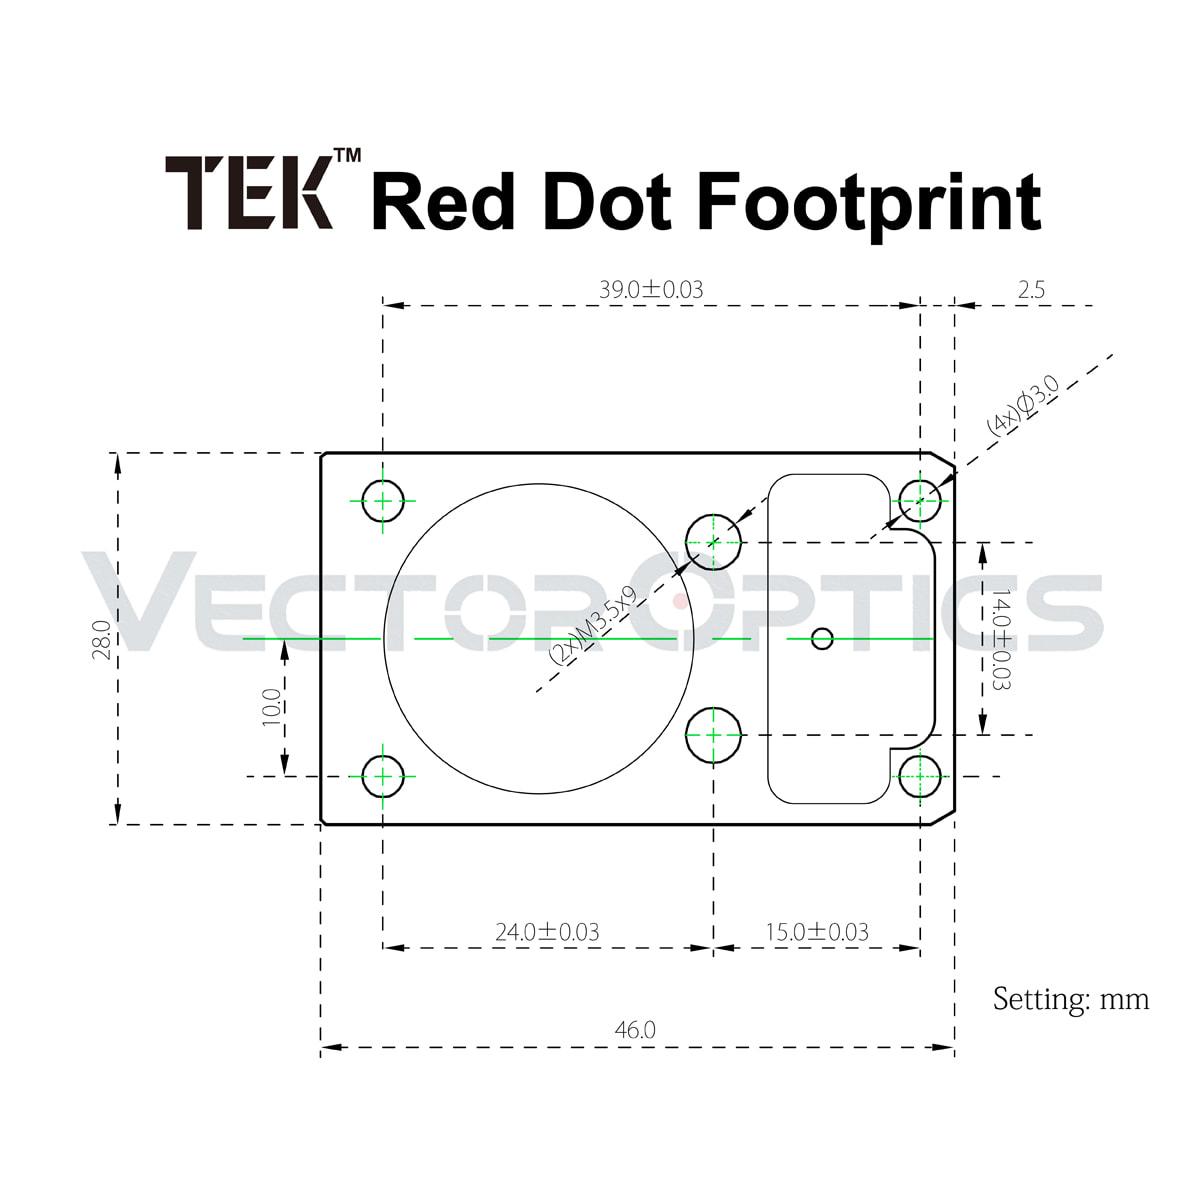 VO TEK Footprint Acom Diagram - 副本